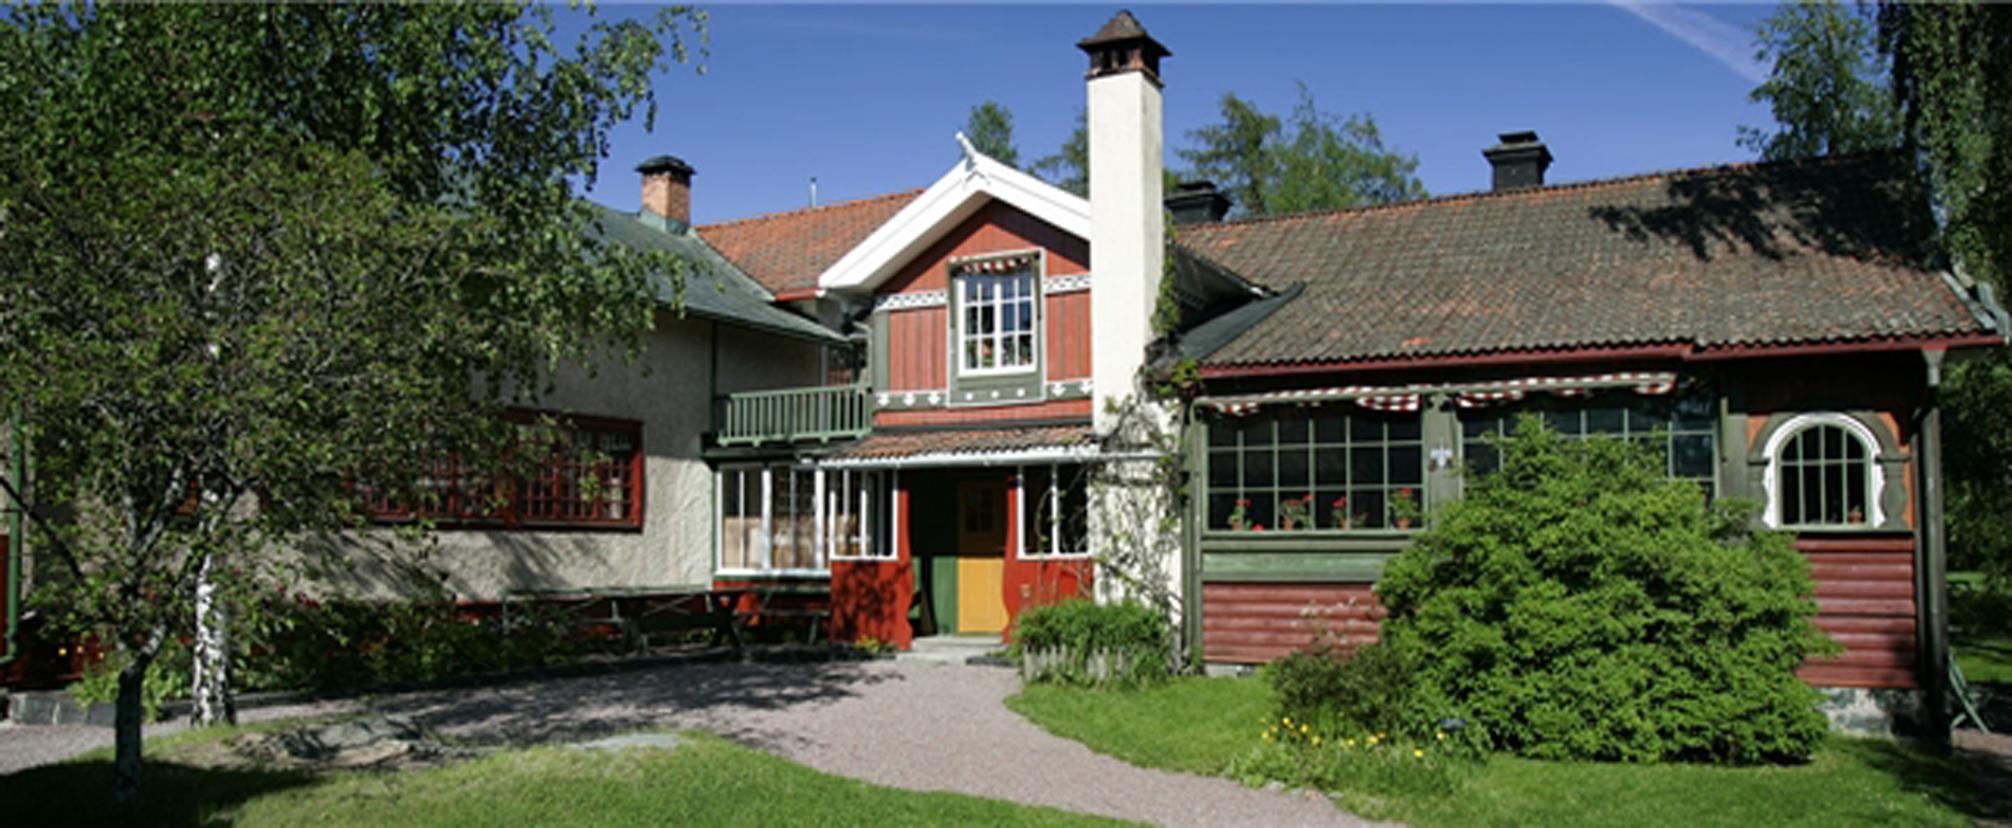 Sundborn, Sweden   Carl Larsson 2.JPG